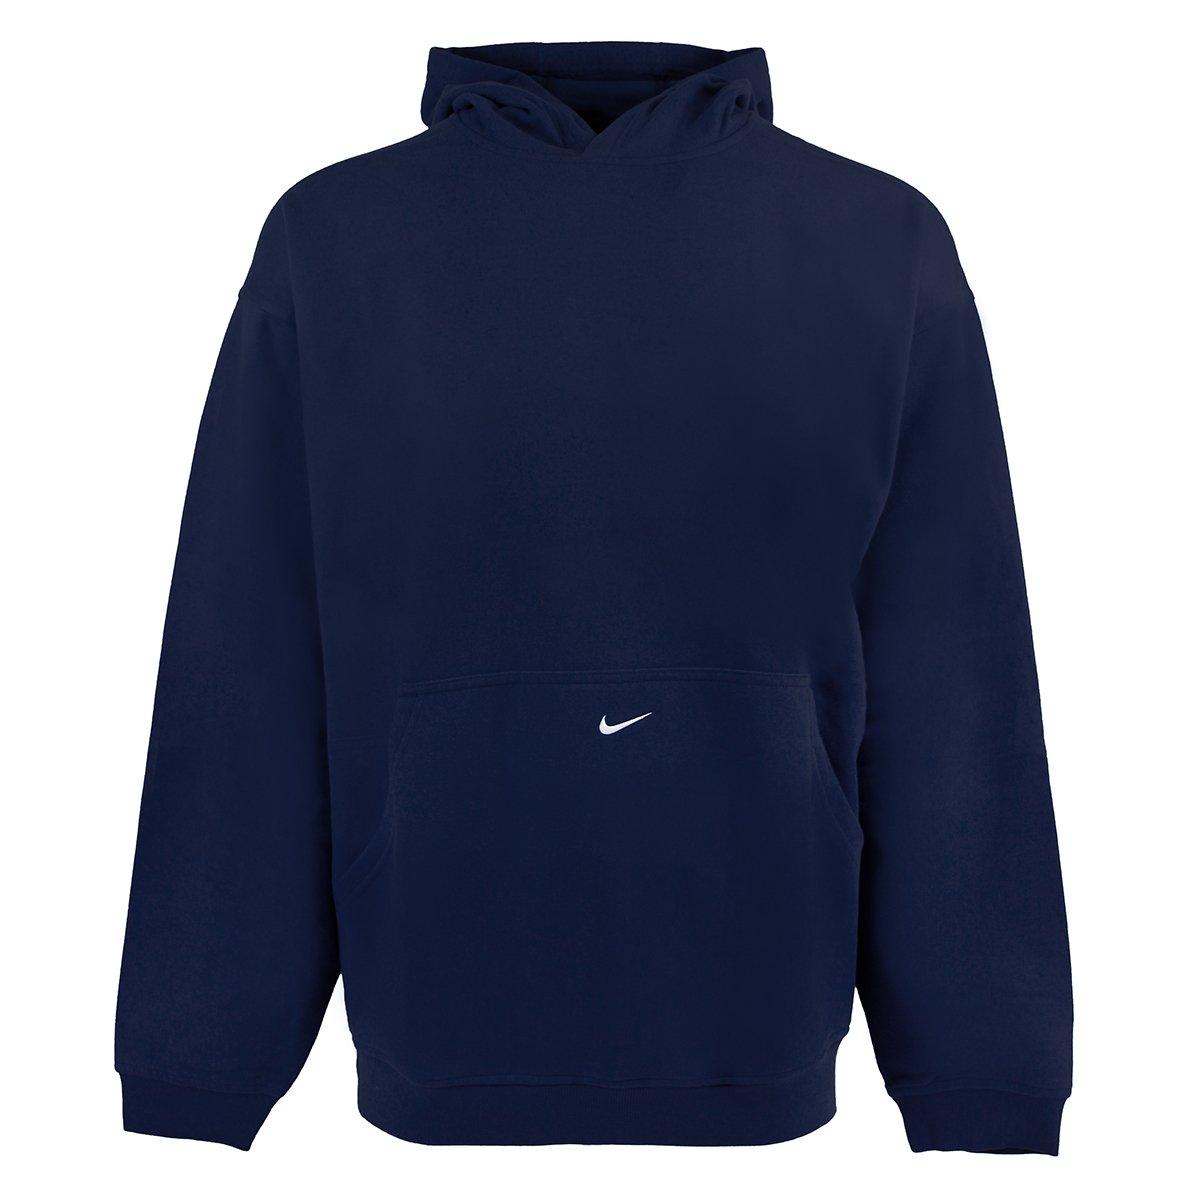 Nike Damenschuhe Blazer Niedrig SE W Silbern Silbern W Sneaker Niedrig Silbern 62c97f